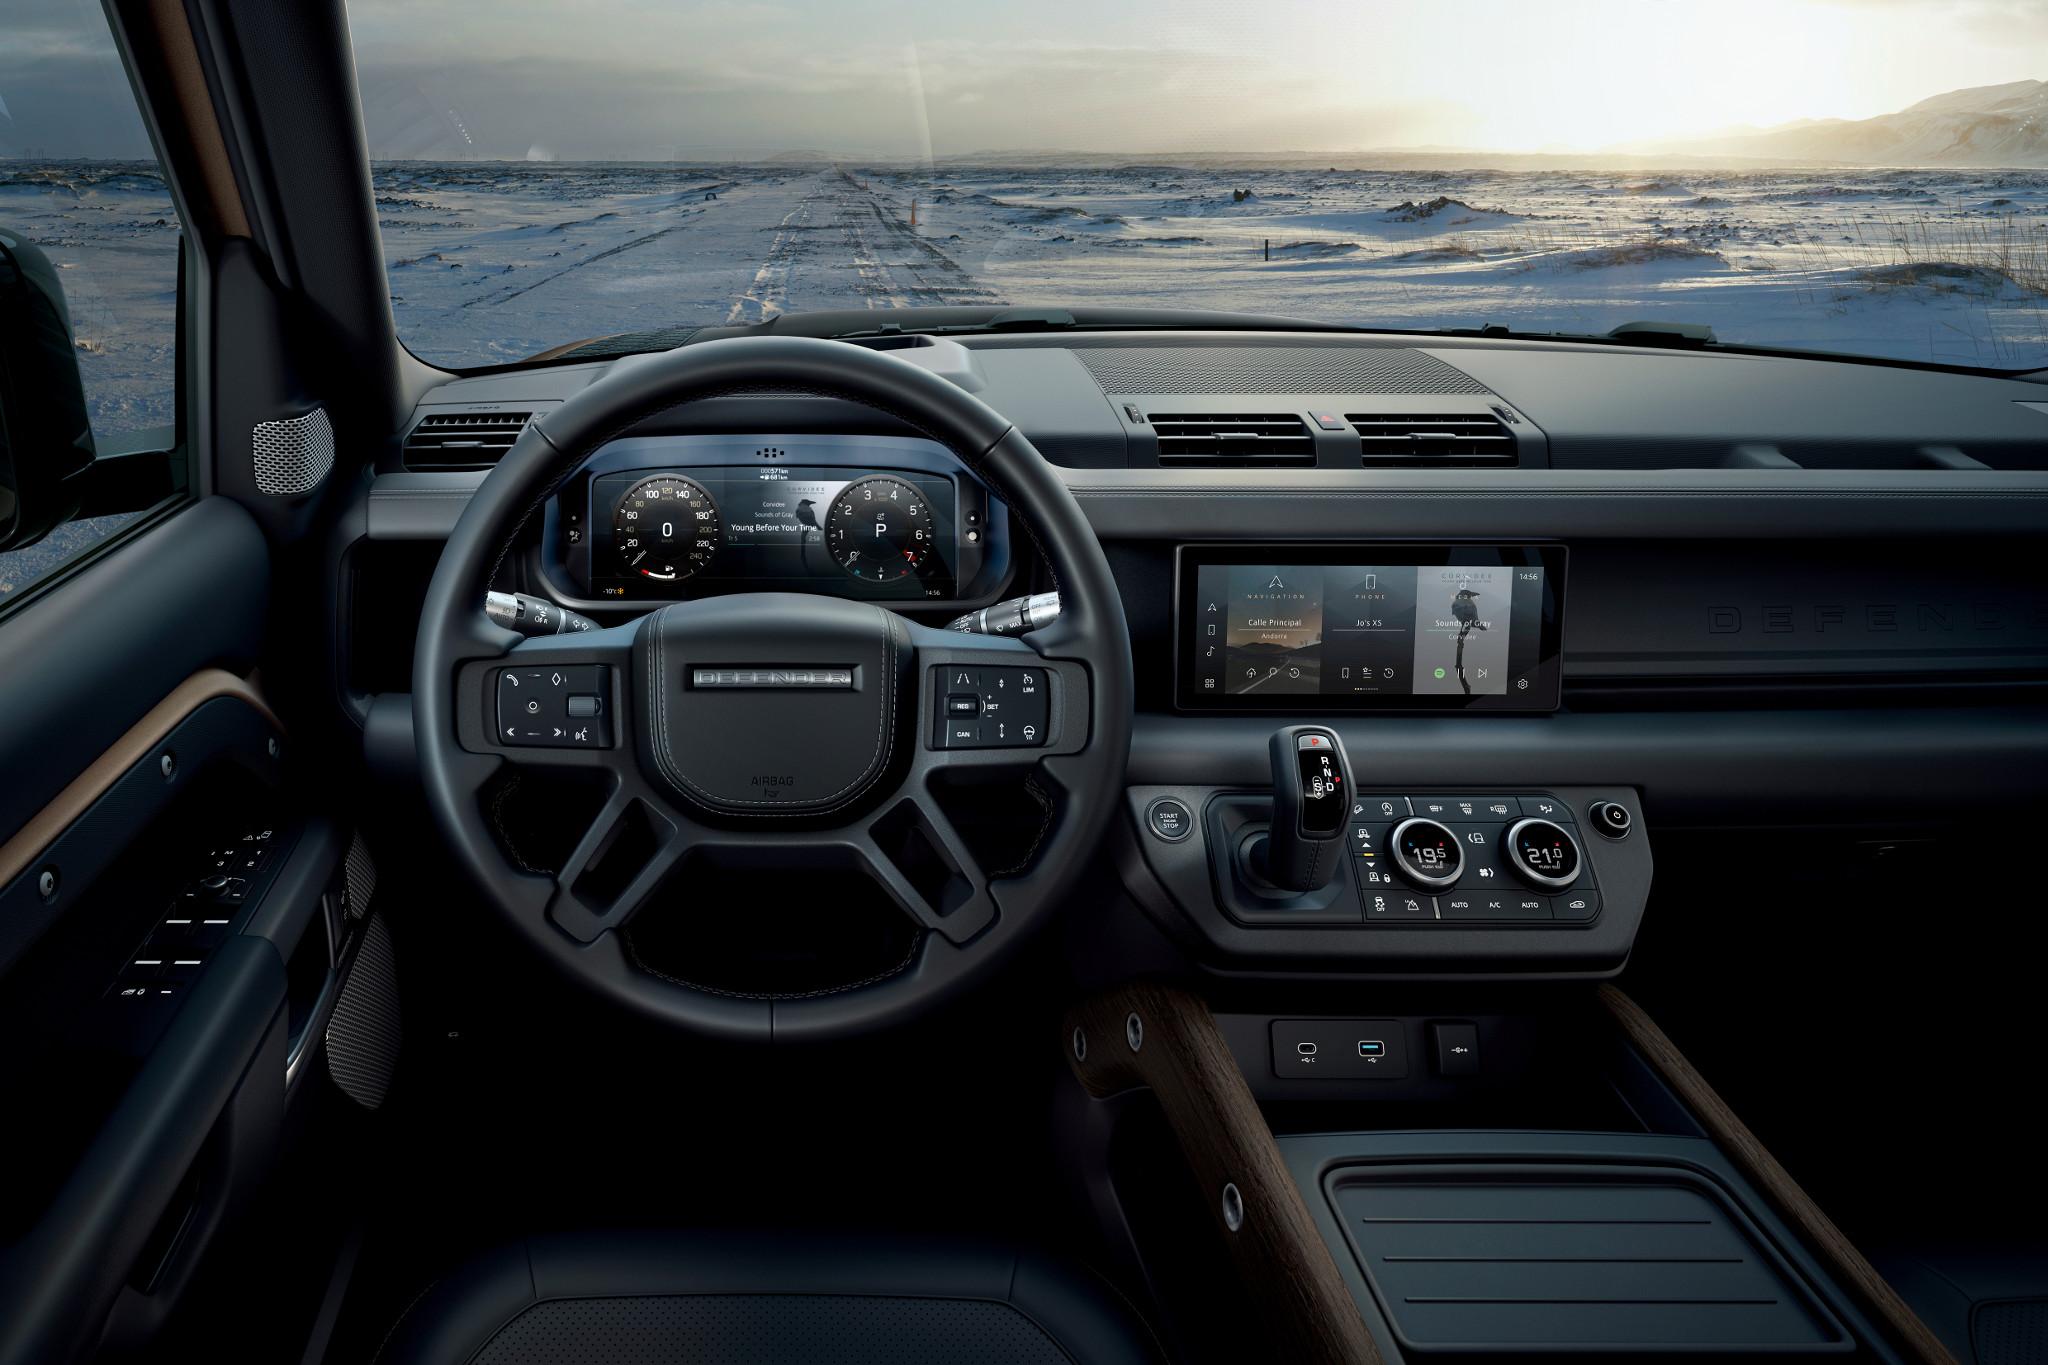 land-rover-defender-2020-08-cockpit-shot--front-row--interior.jpg